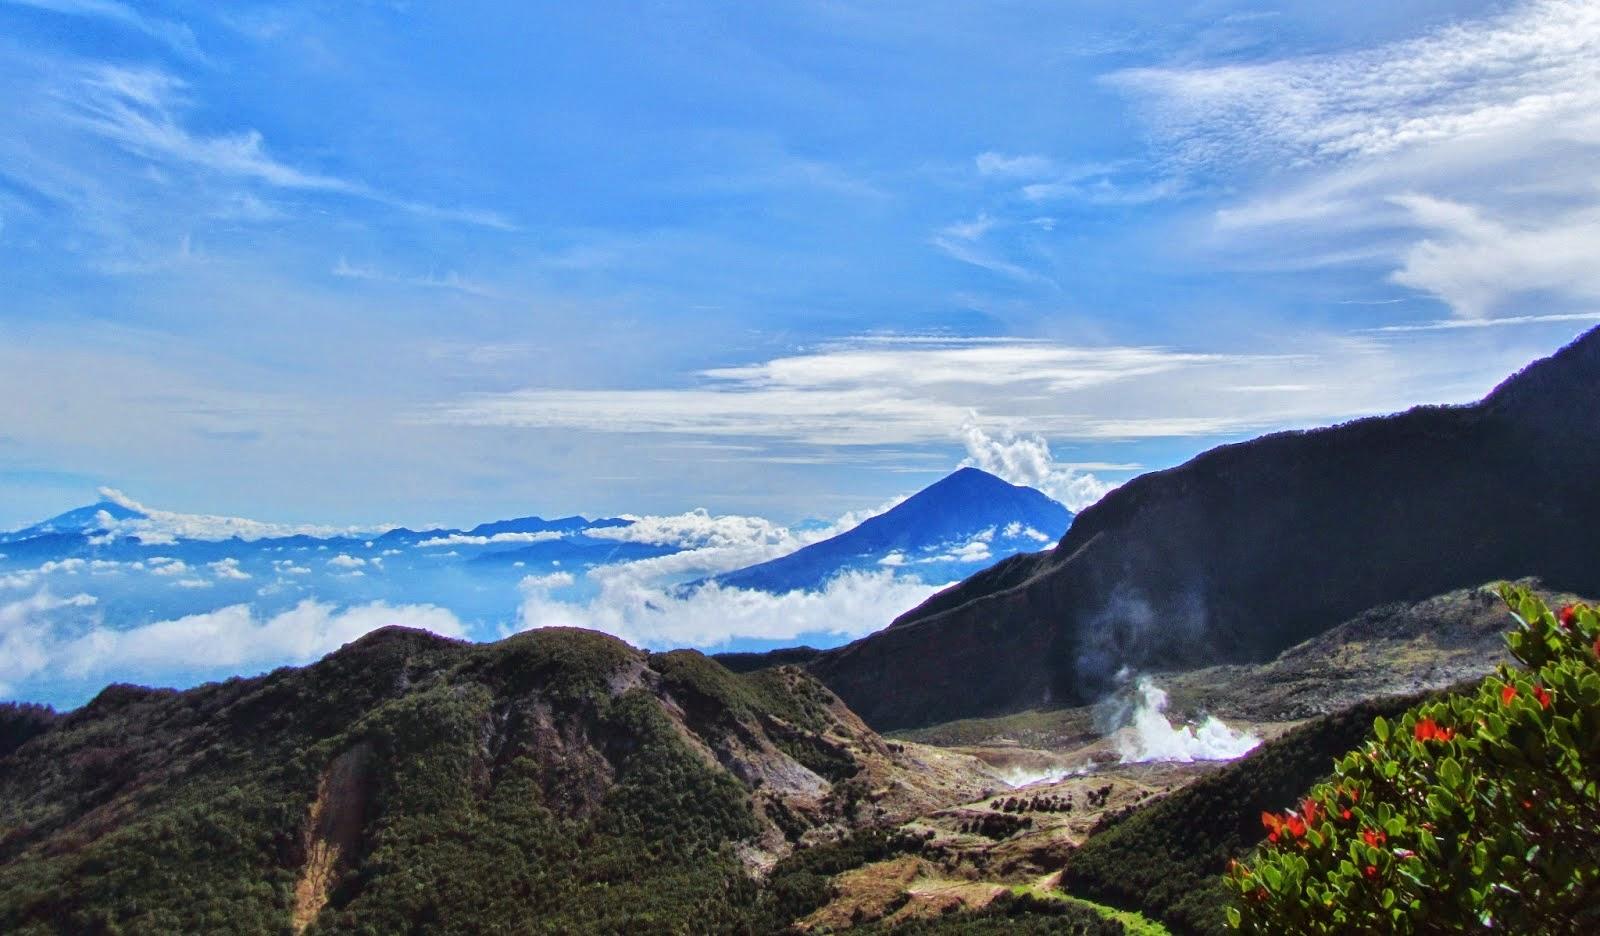 jalur pendakian gunung di jawa barat favorit pendaki